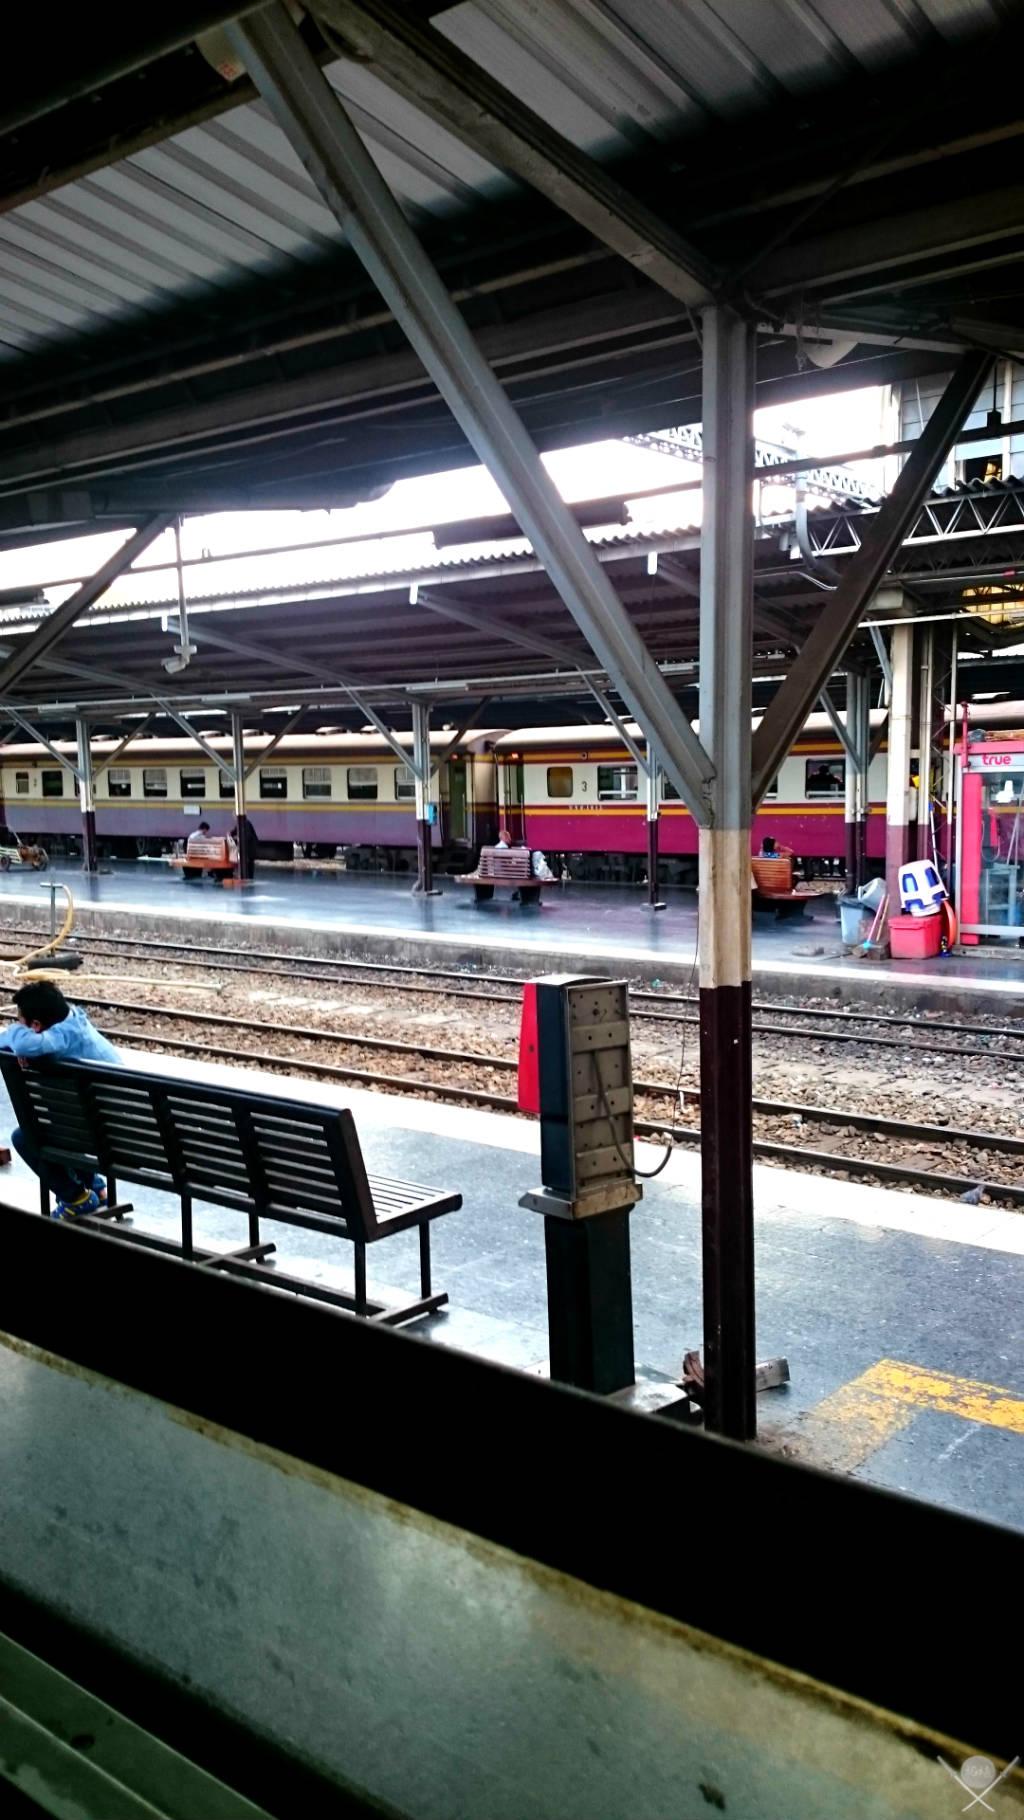 Thailand Ayutthaya Trem Vida de Tsuge VDT 1024x1820